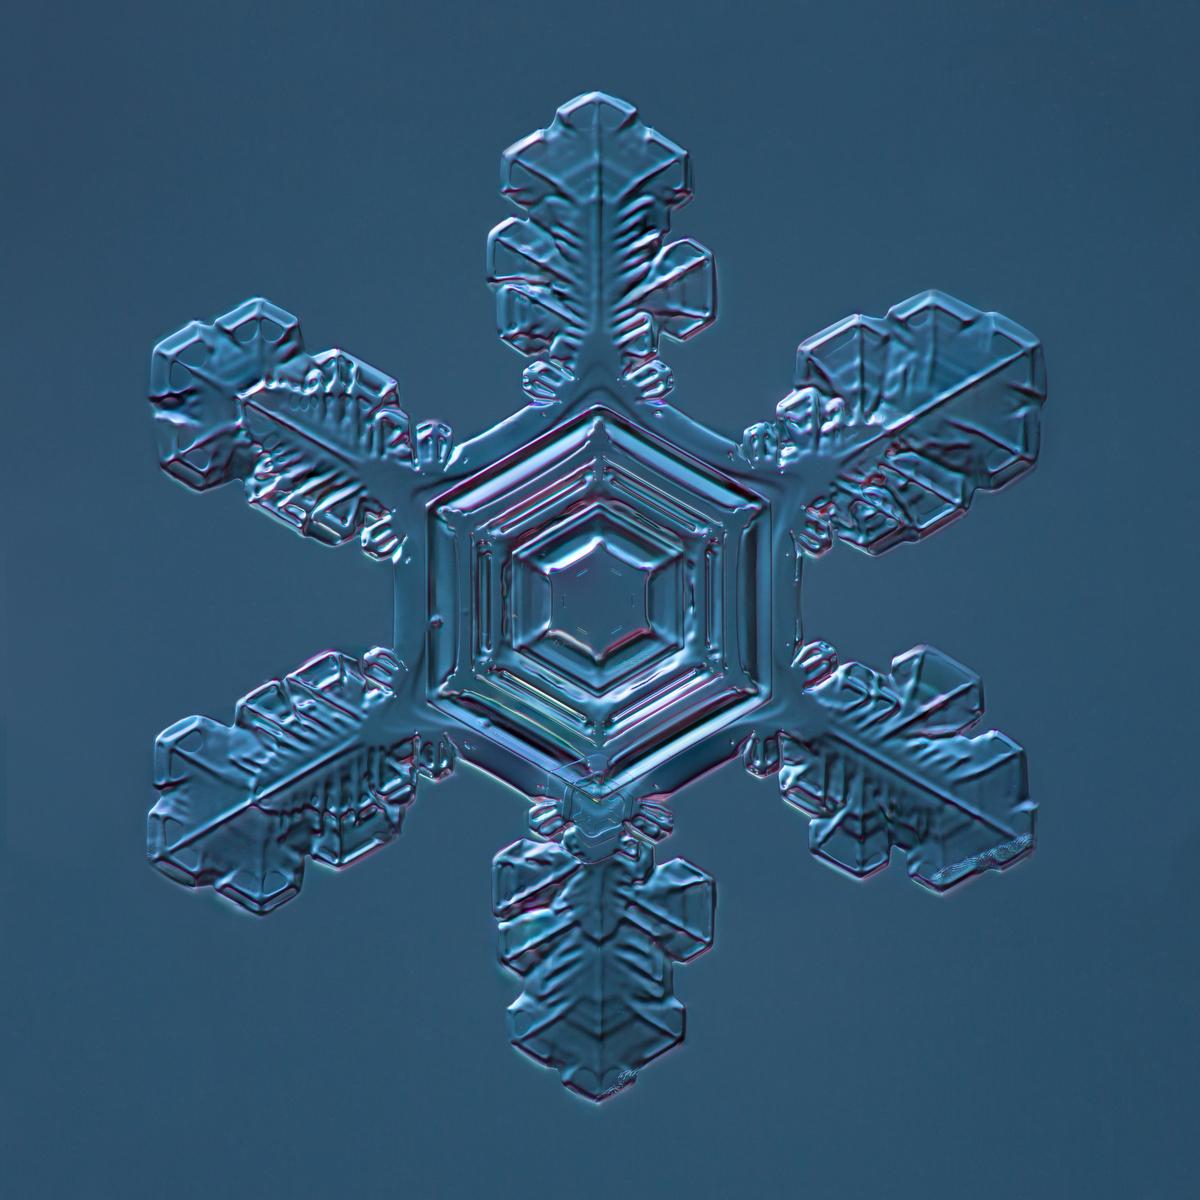 Snowflake 2015.01.02.003